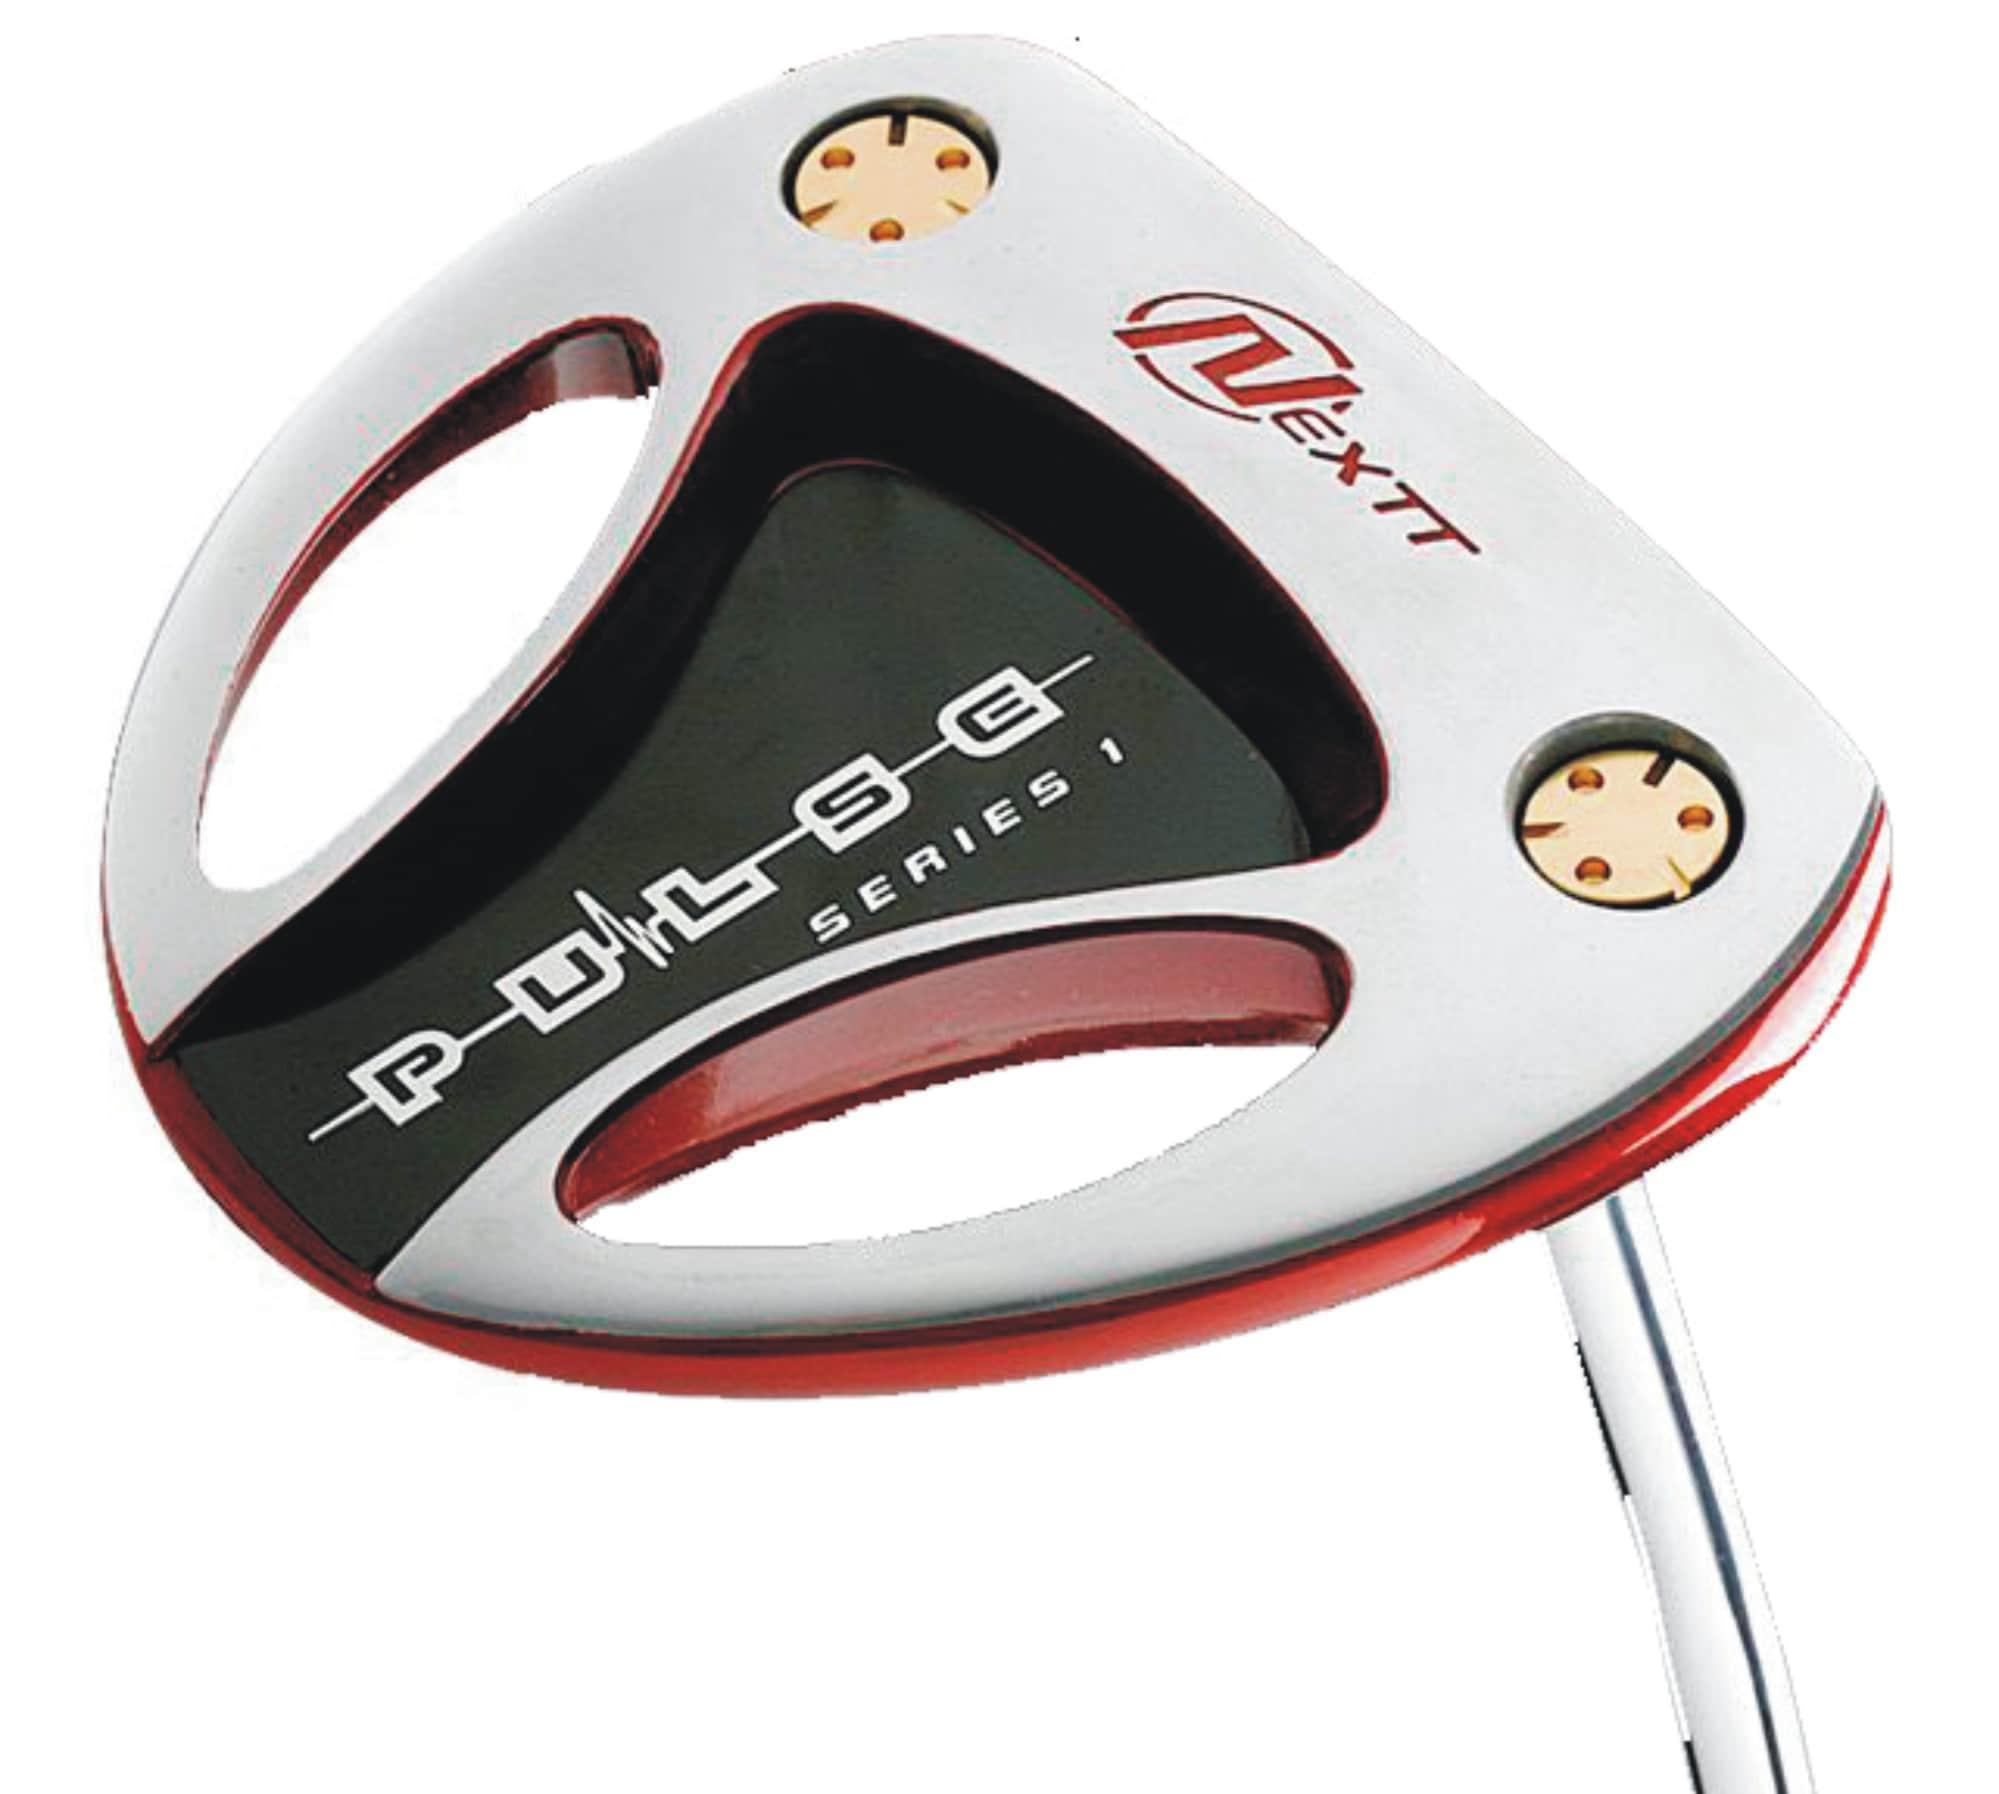 Nextt Golf Pulse Series 1 Forged RH Mallet Putter